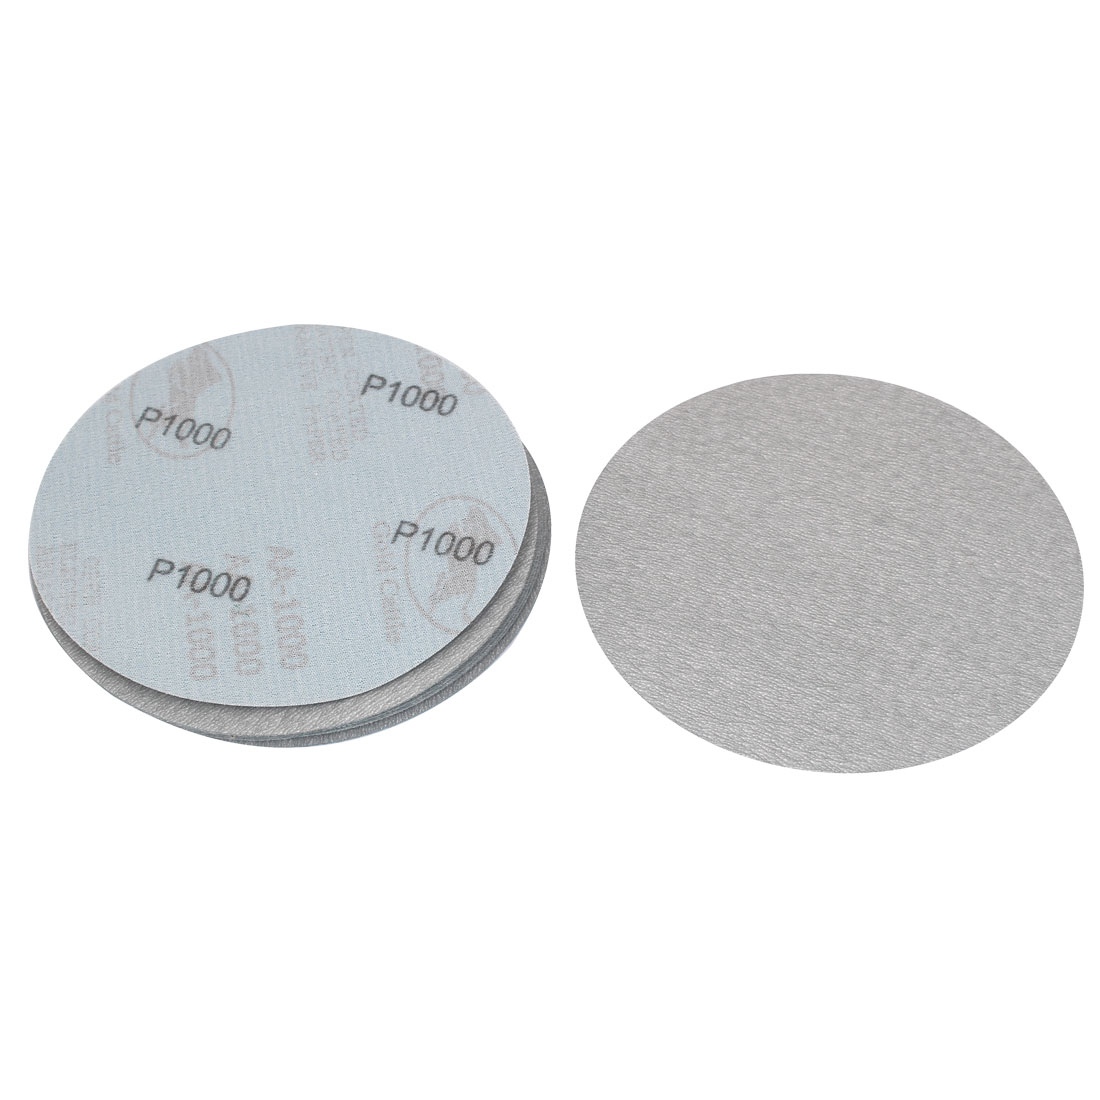 6inch Dia Round Dry Abrasive Sanding Flocking Sandpaper Sheet Disc 1000 Grit 10pcs